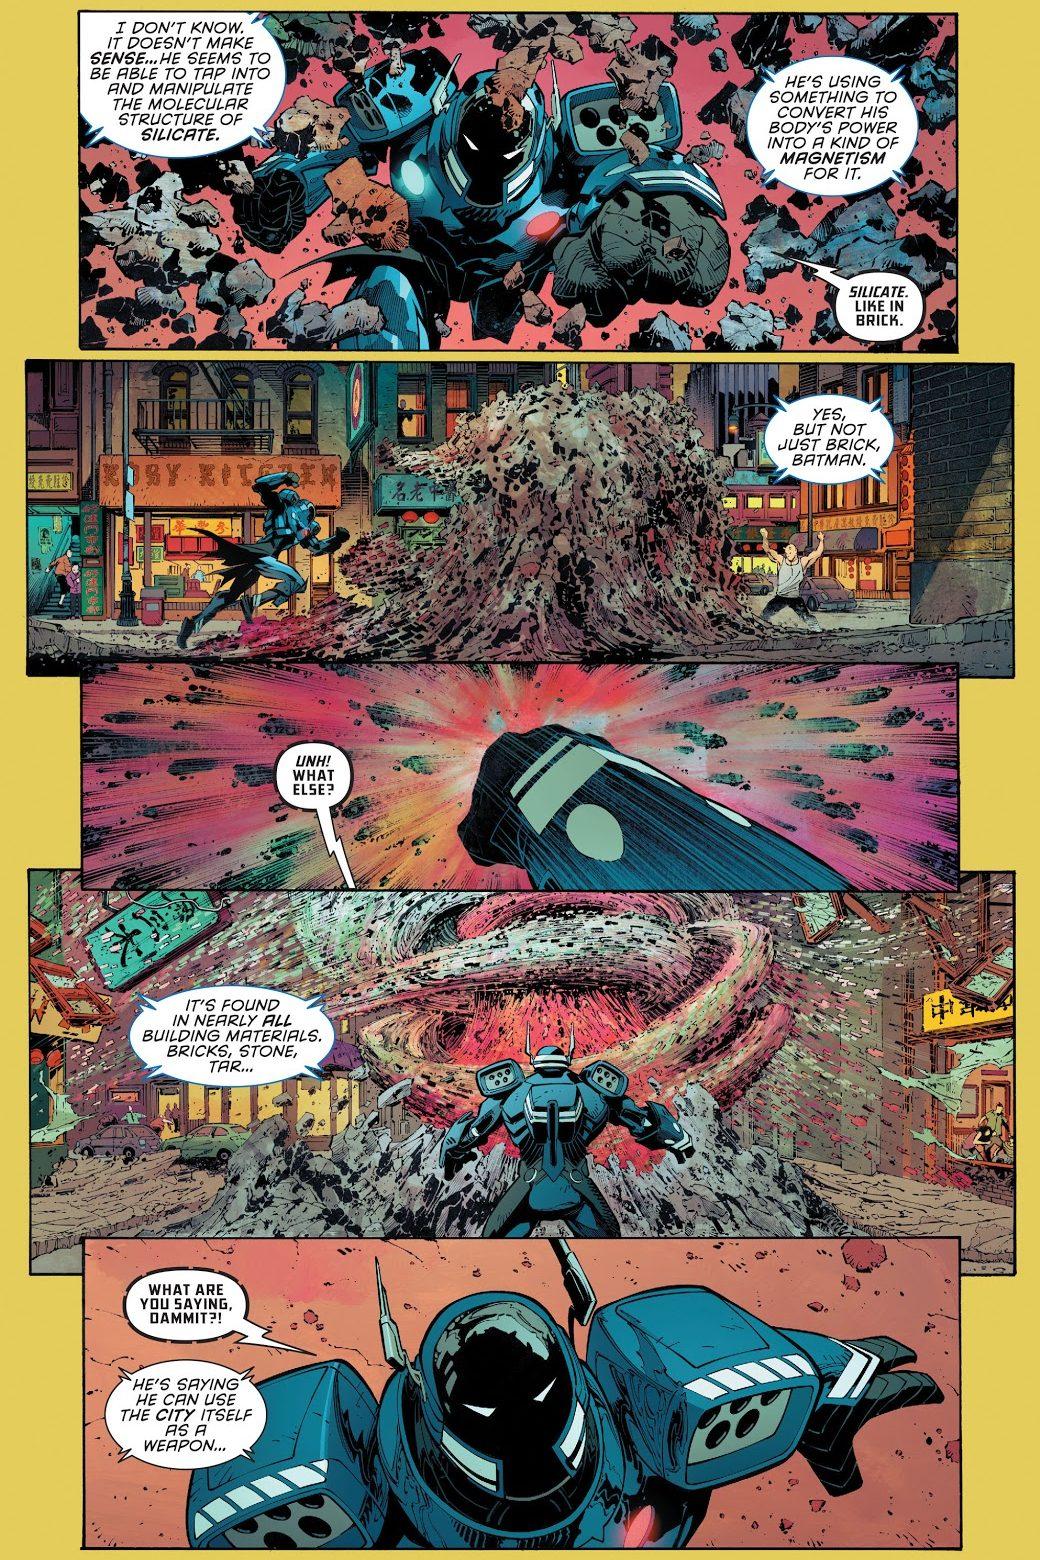 Batman VS Gee Gee Heung